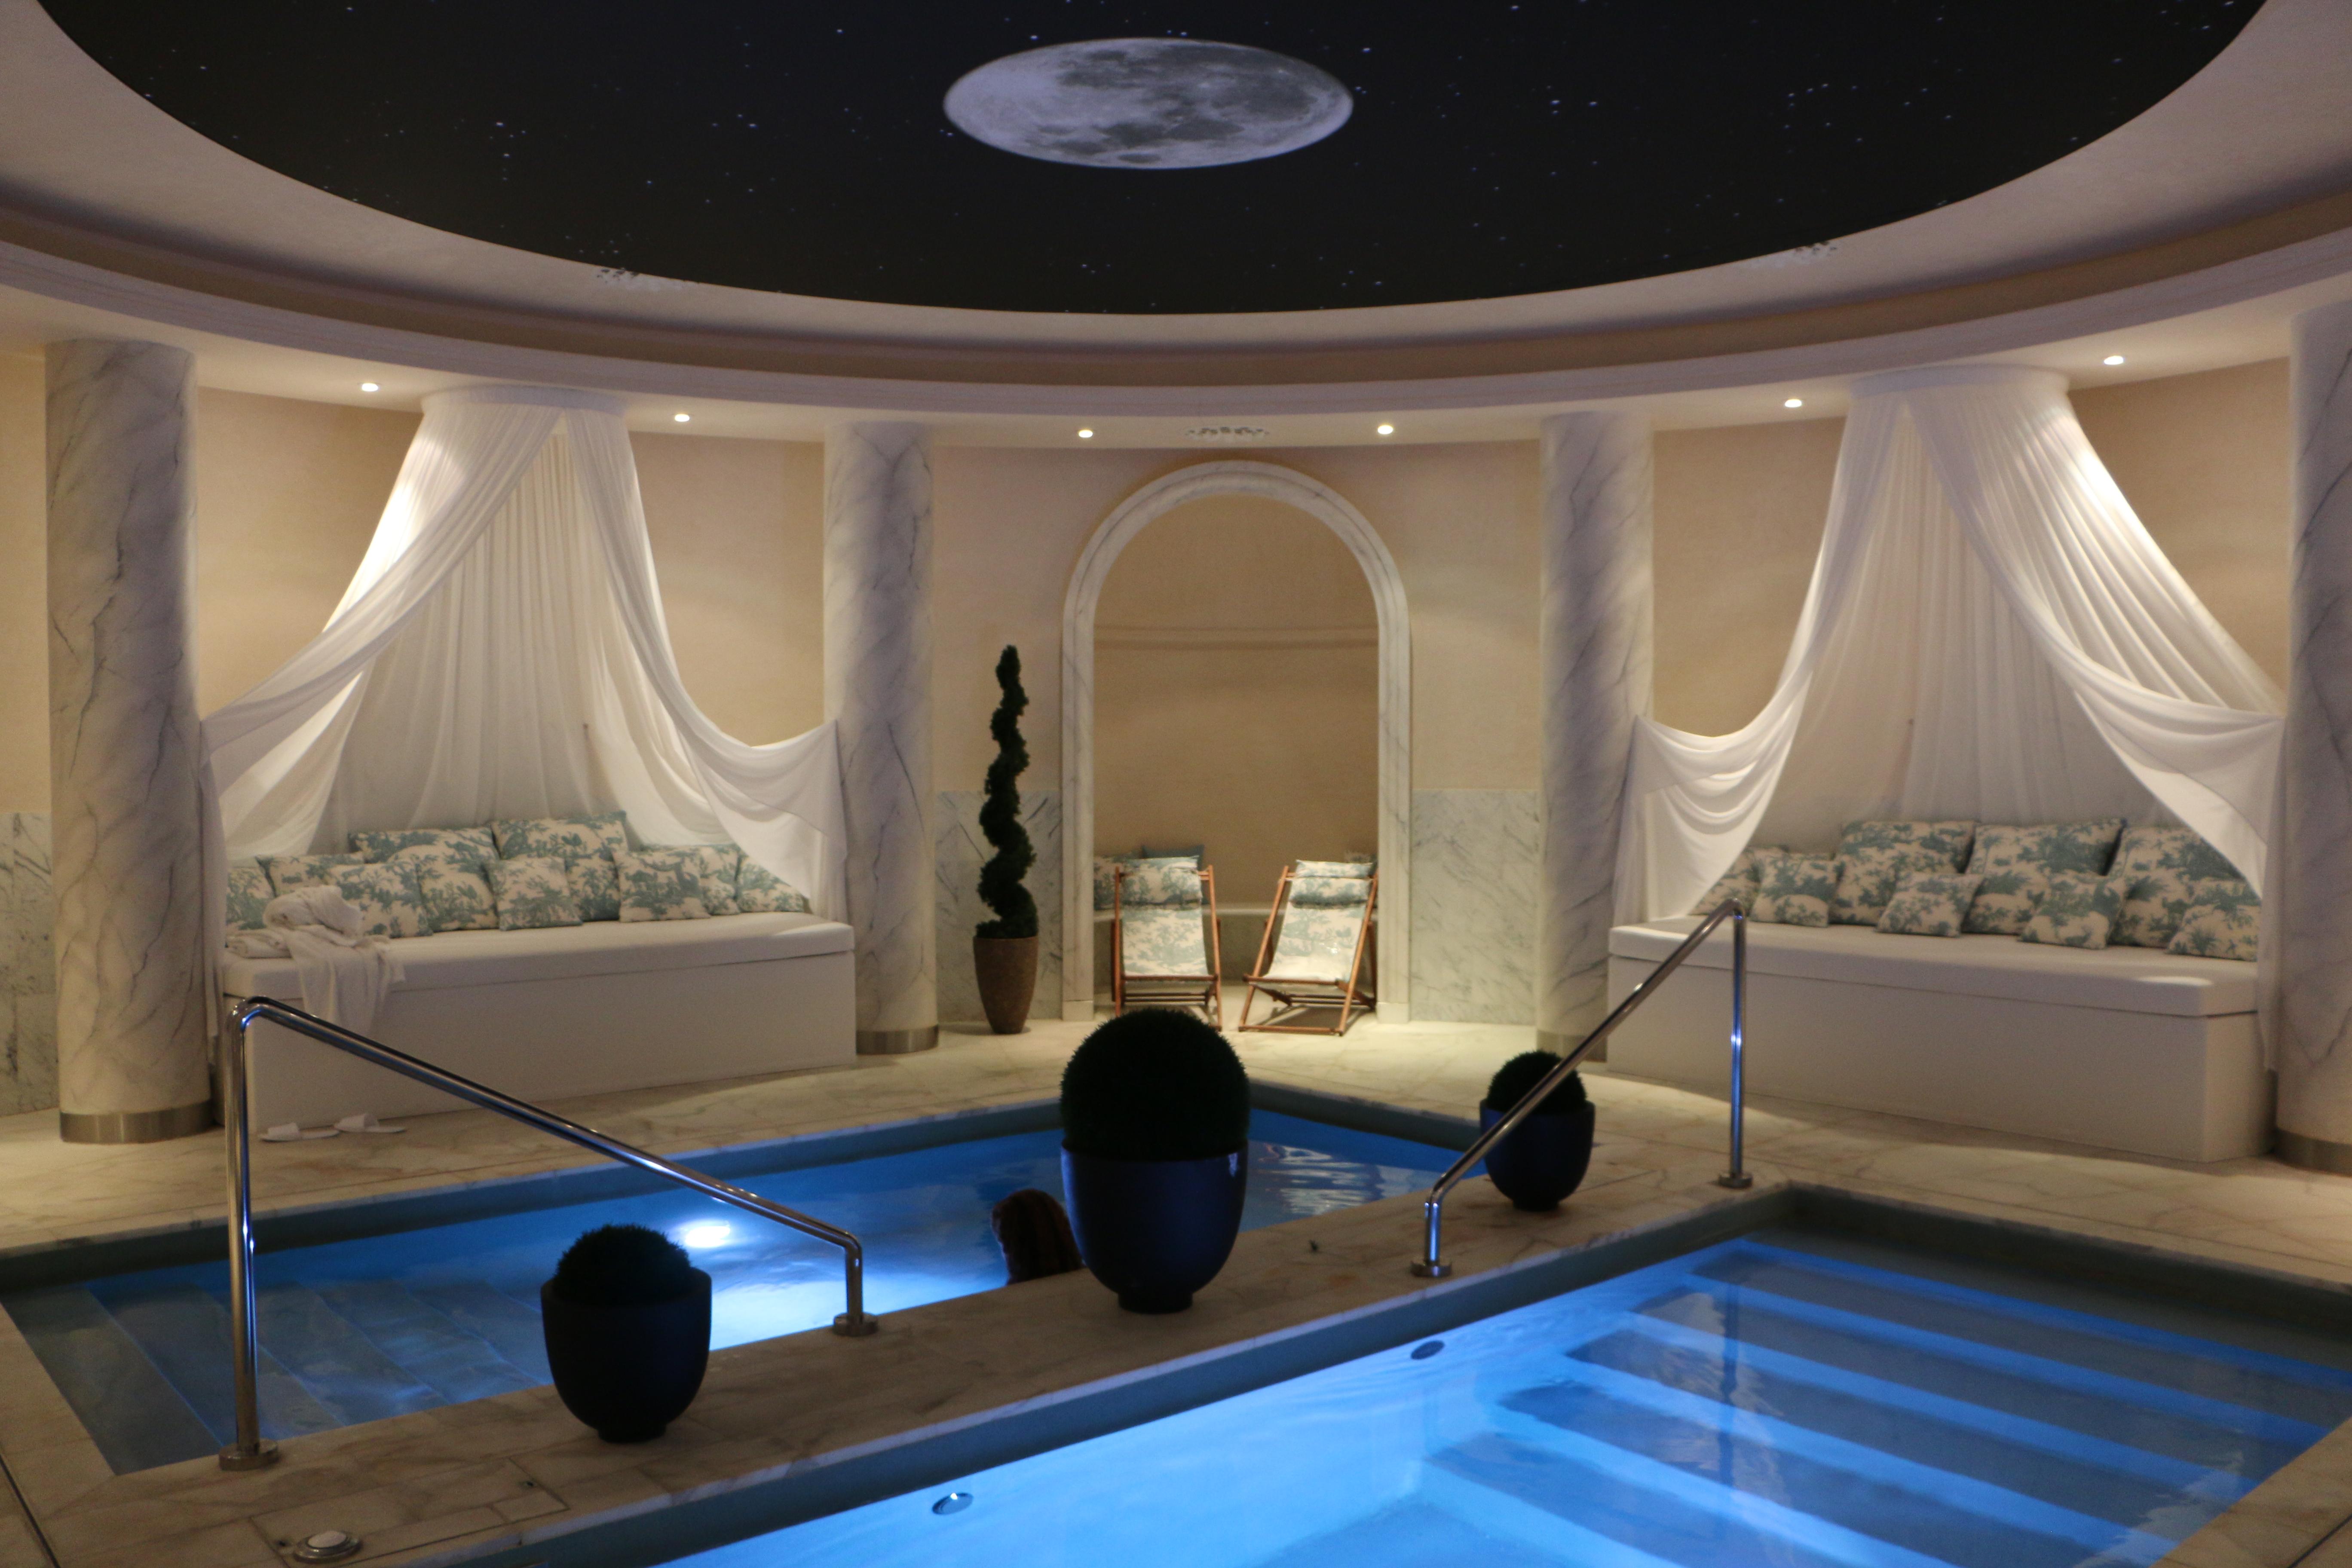 Aquamoon luxury spa At Place Vendôme